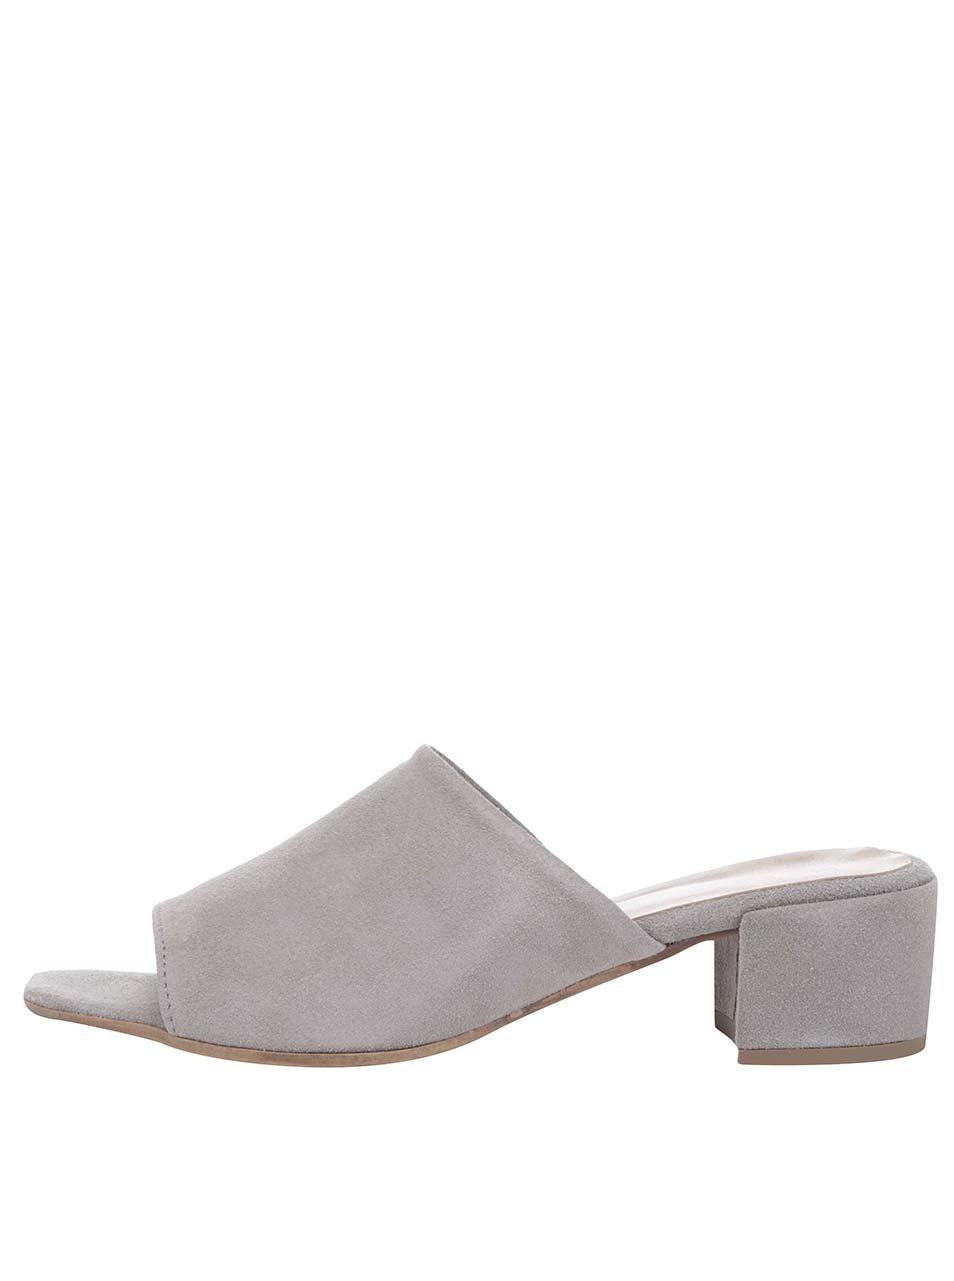 Šedé semišové pantofle na podpatku Tamaris